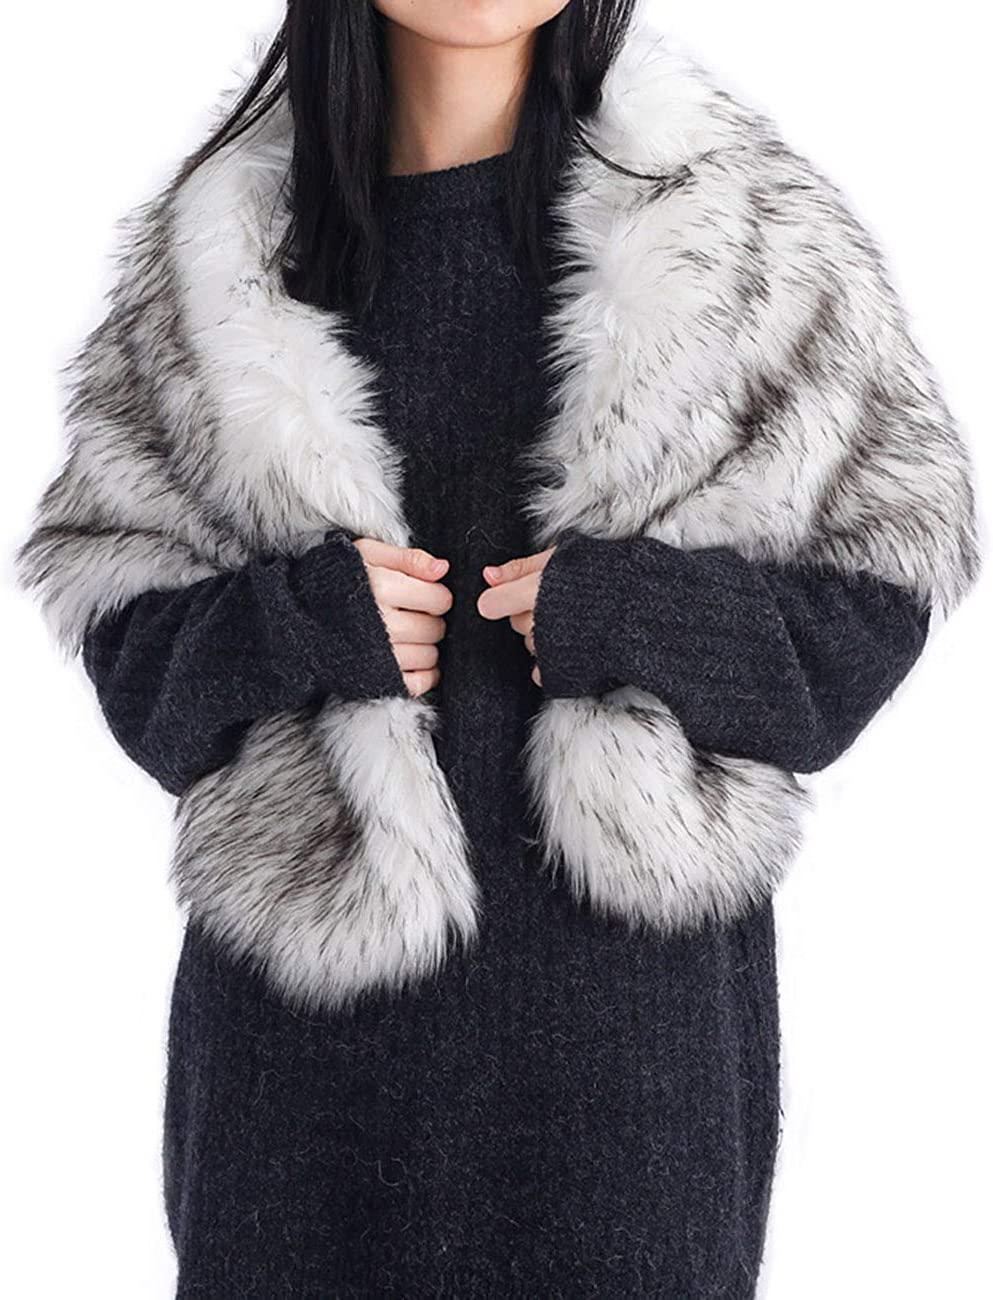 Artio Women's Faux Fur Wraps and Shawls Stole Shrug Winter Bridal Wedding Cape